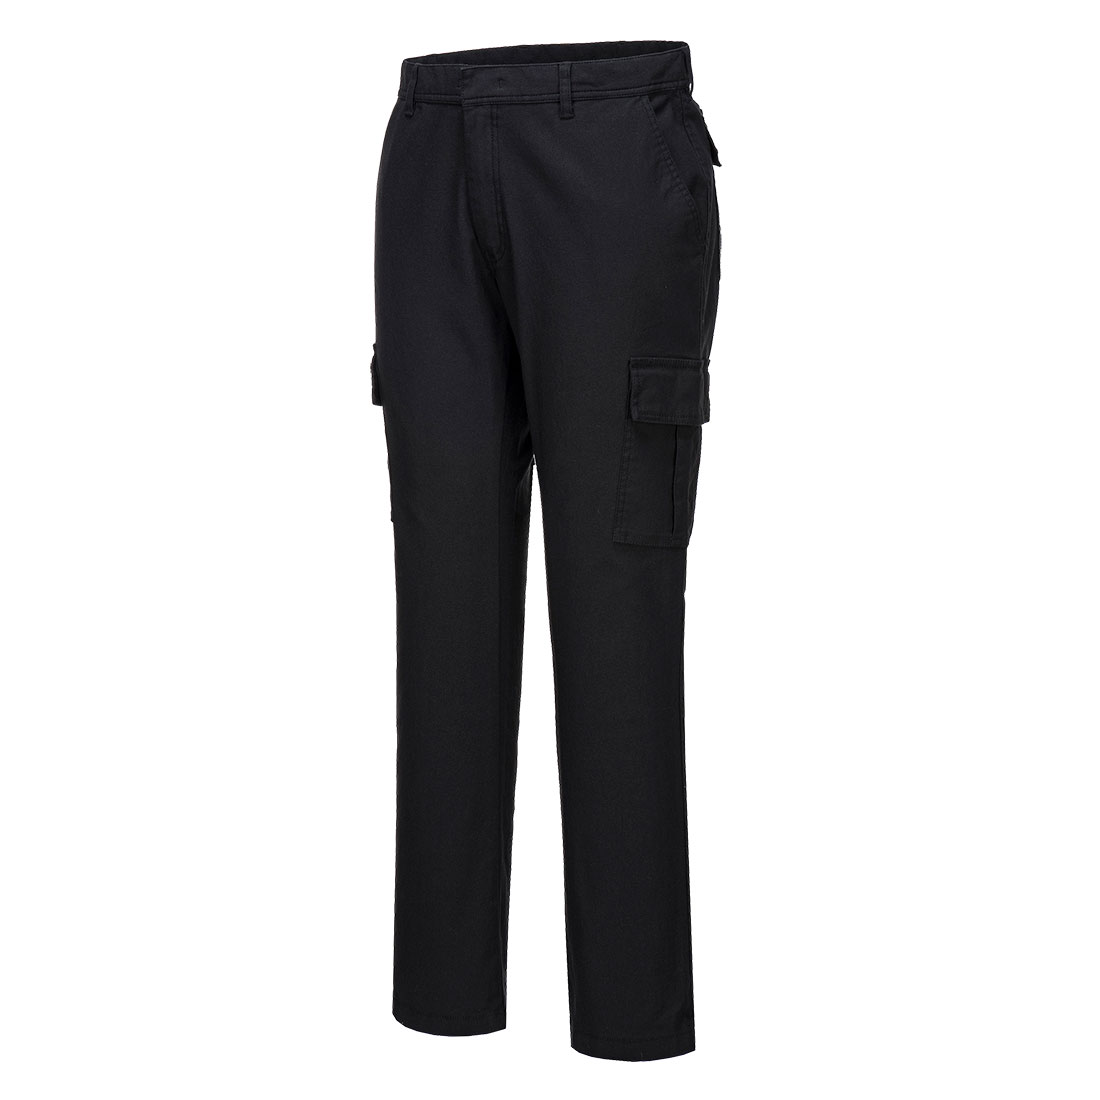 Stretch Combat Trousers Black 44R